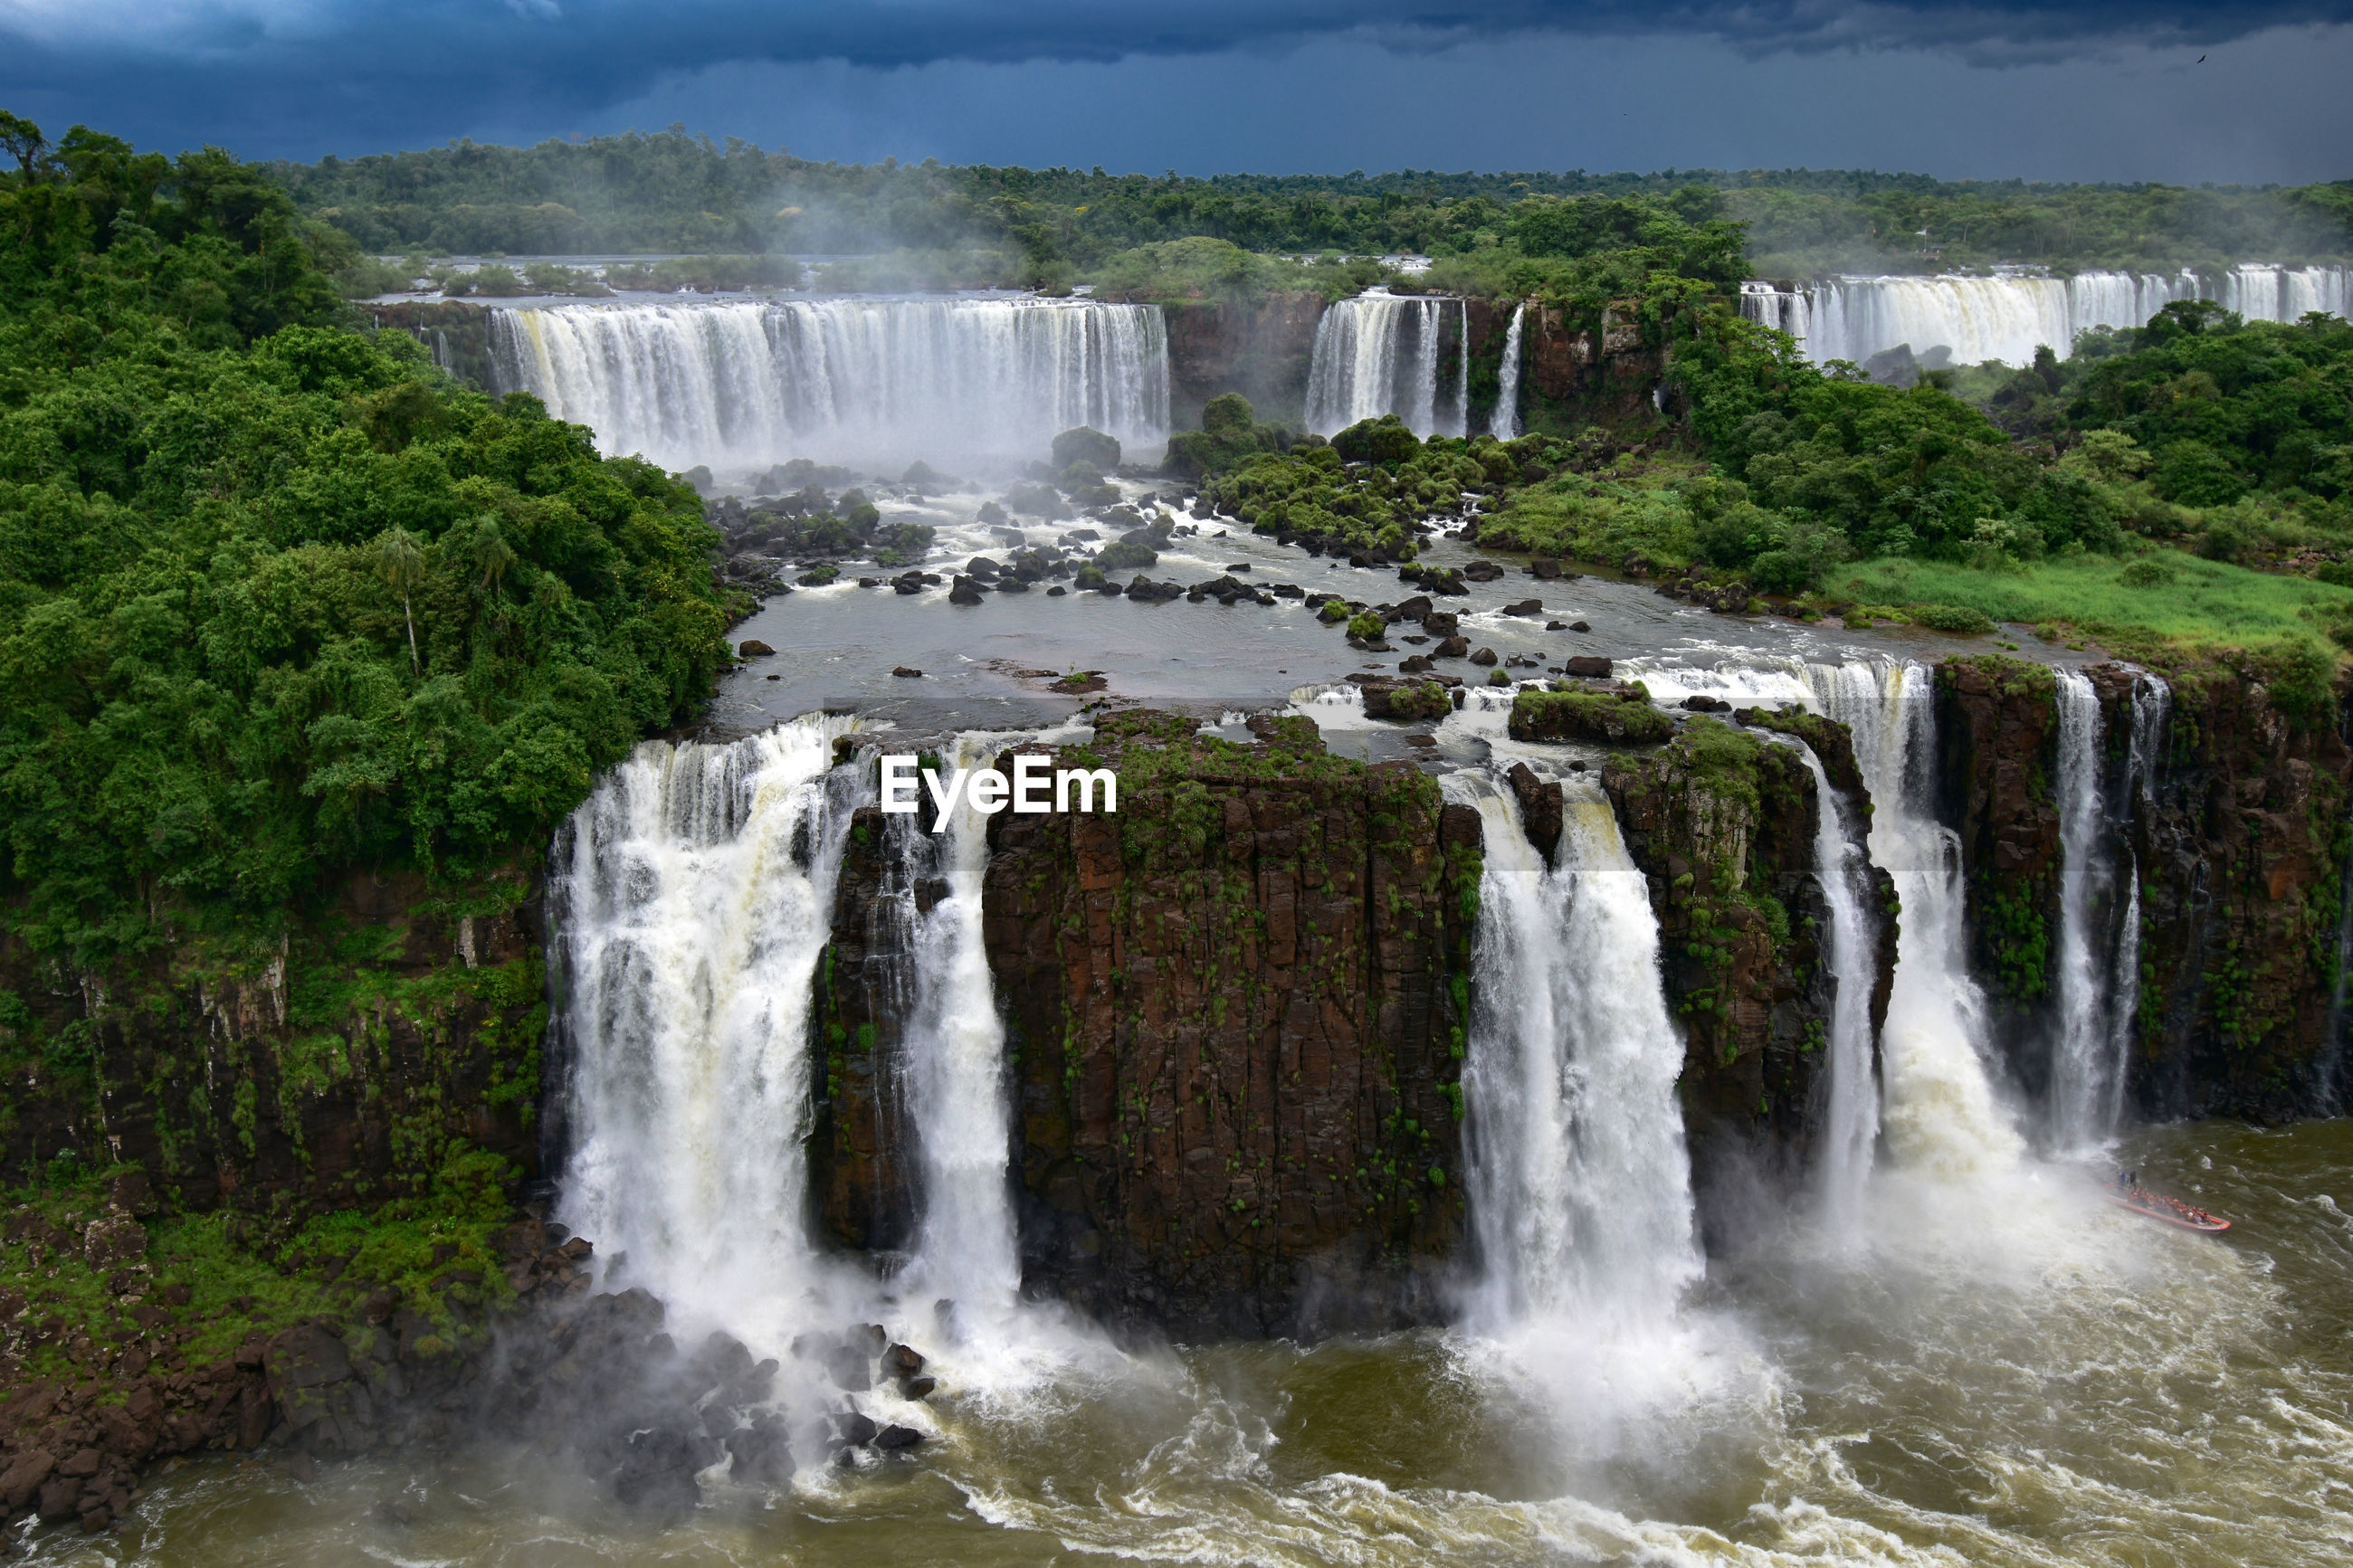 Scenic view of waterfall - cataratas do iguaçu